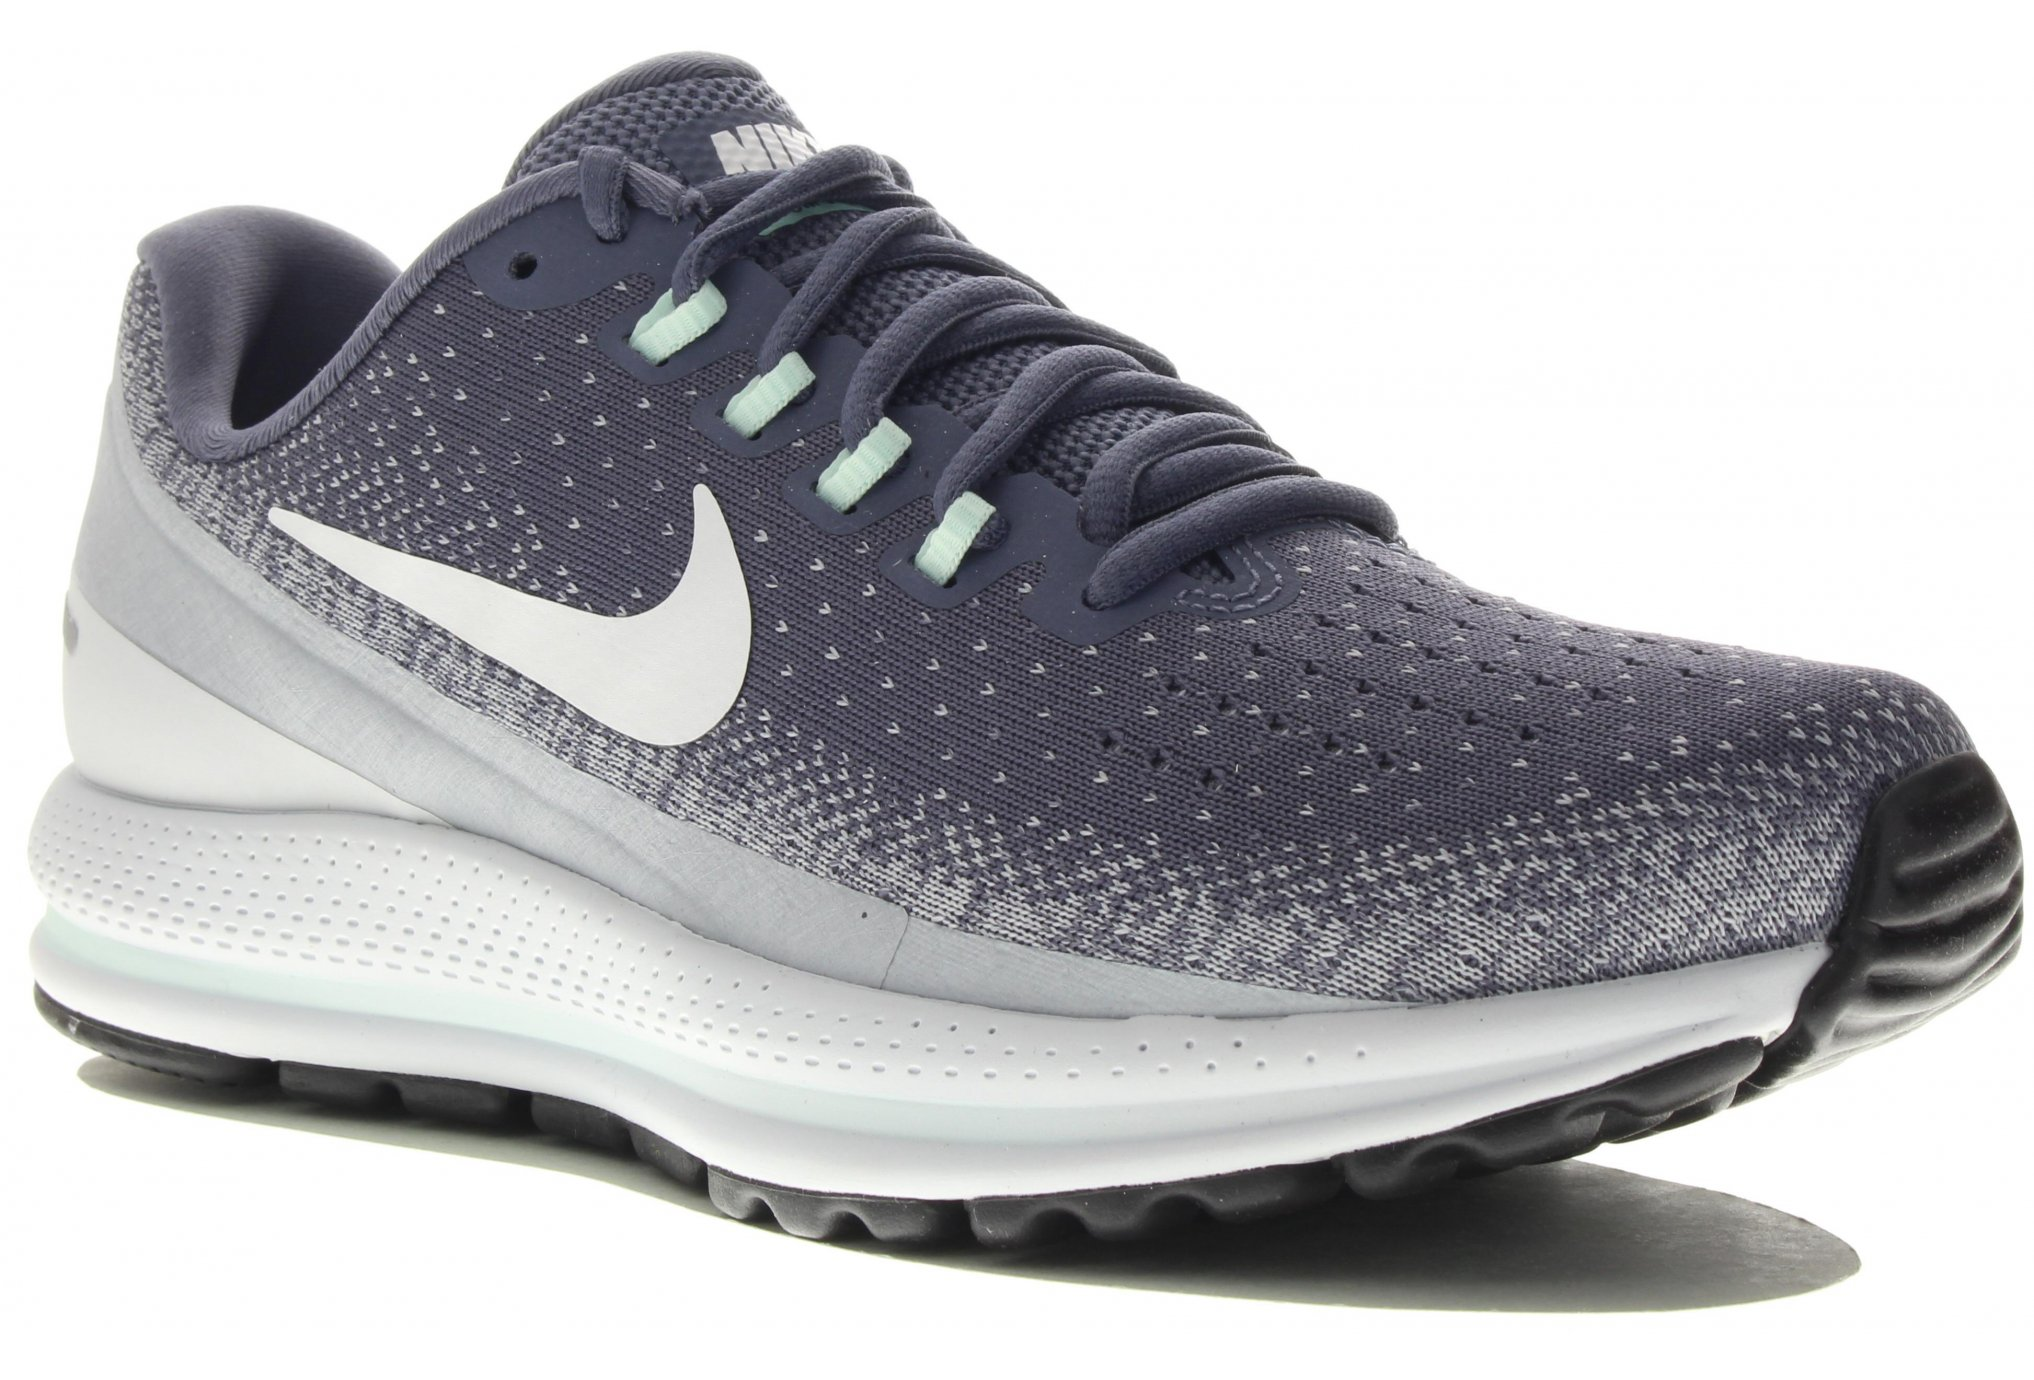 Nike Air Zoom Vomero 13 W Chaussures running femme